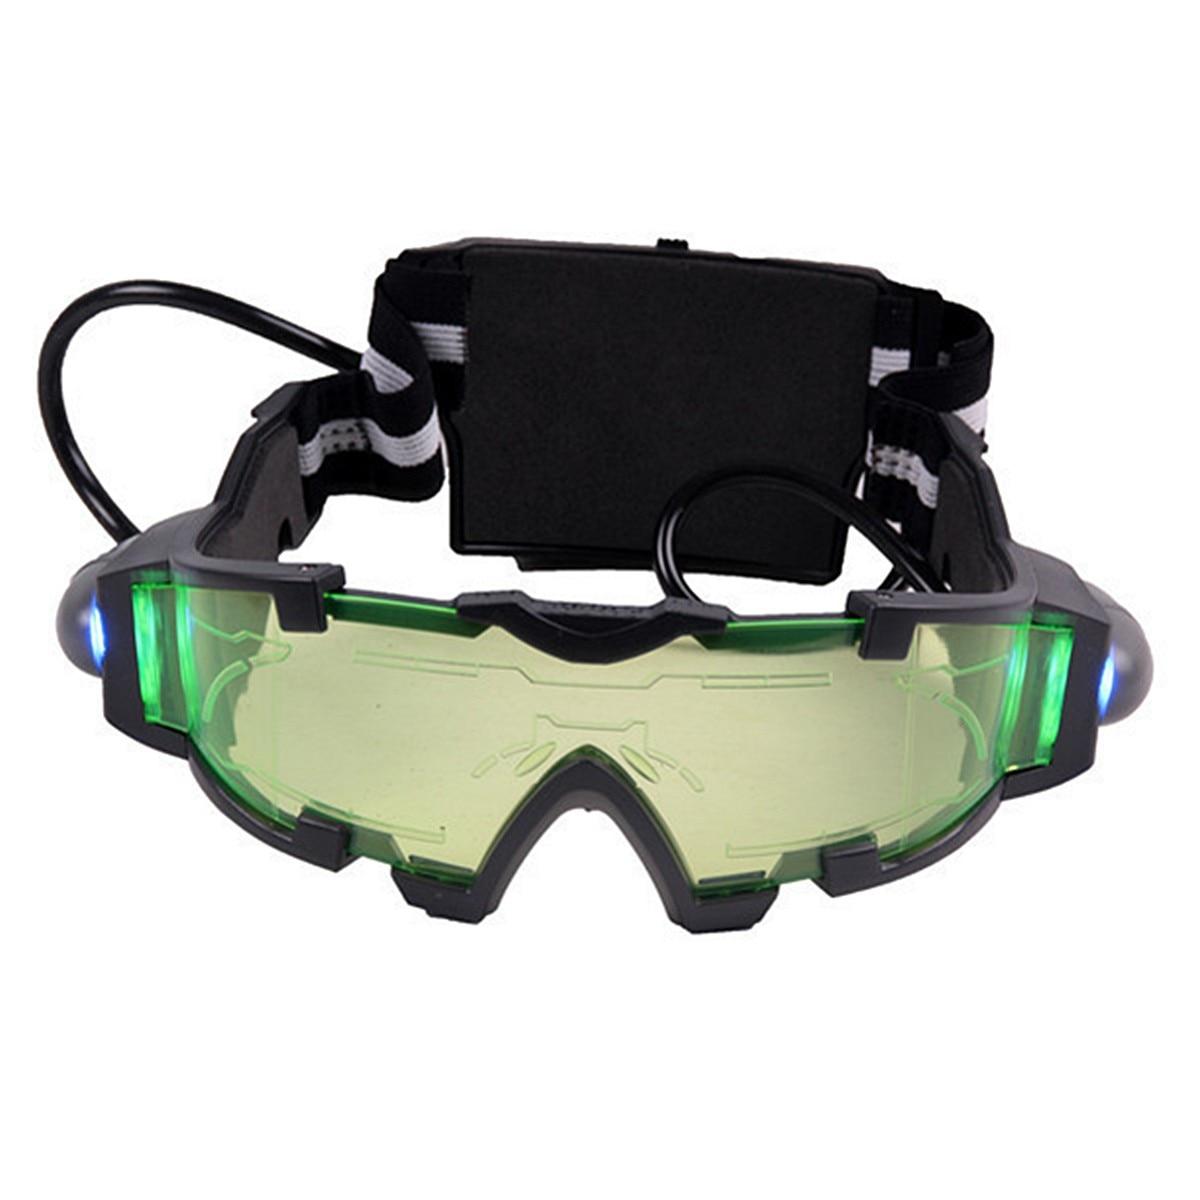 Dapat Disesuaikan Elastis Militer Malam Vision Kacamata Olahraga Anti Silau Kuning Night View Glasses Sj0038 Tahan Angin Keamanan Eyeshield Perlindungan Mata Pelindung Di Safety